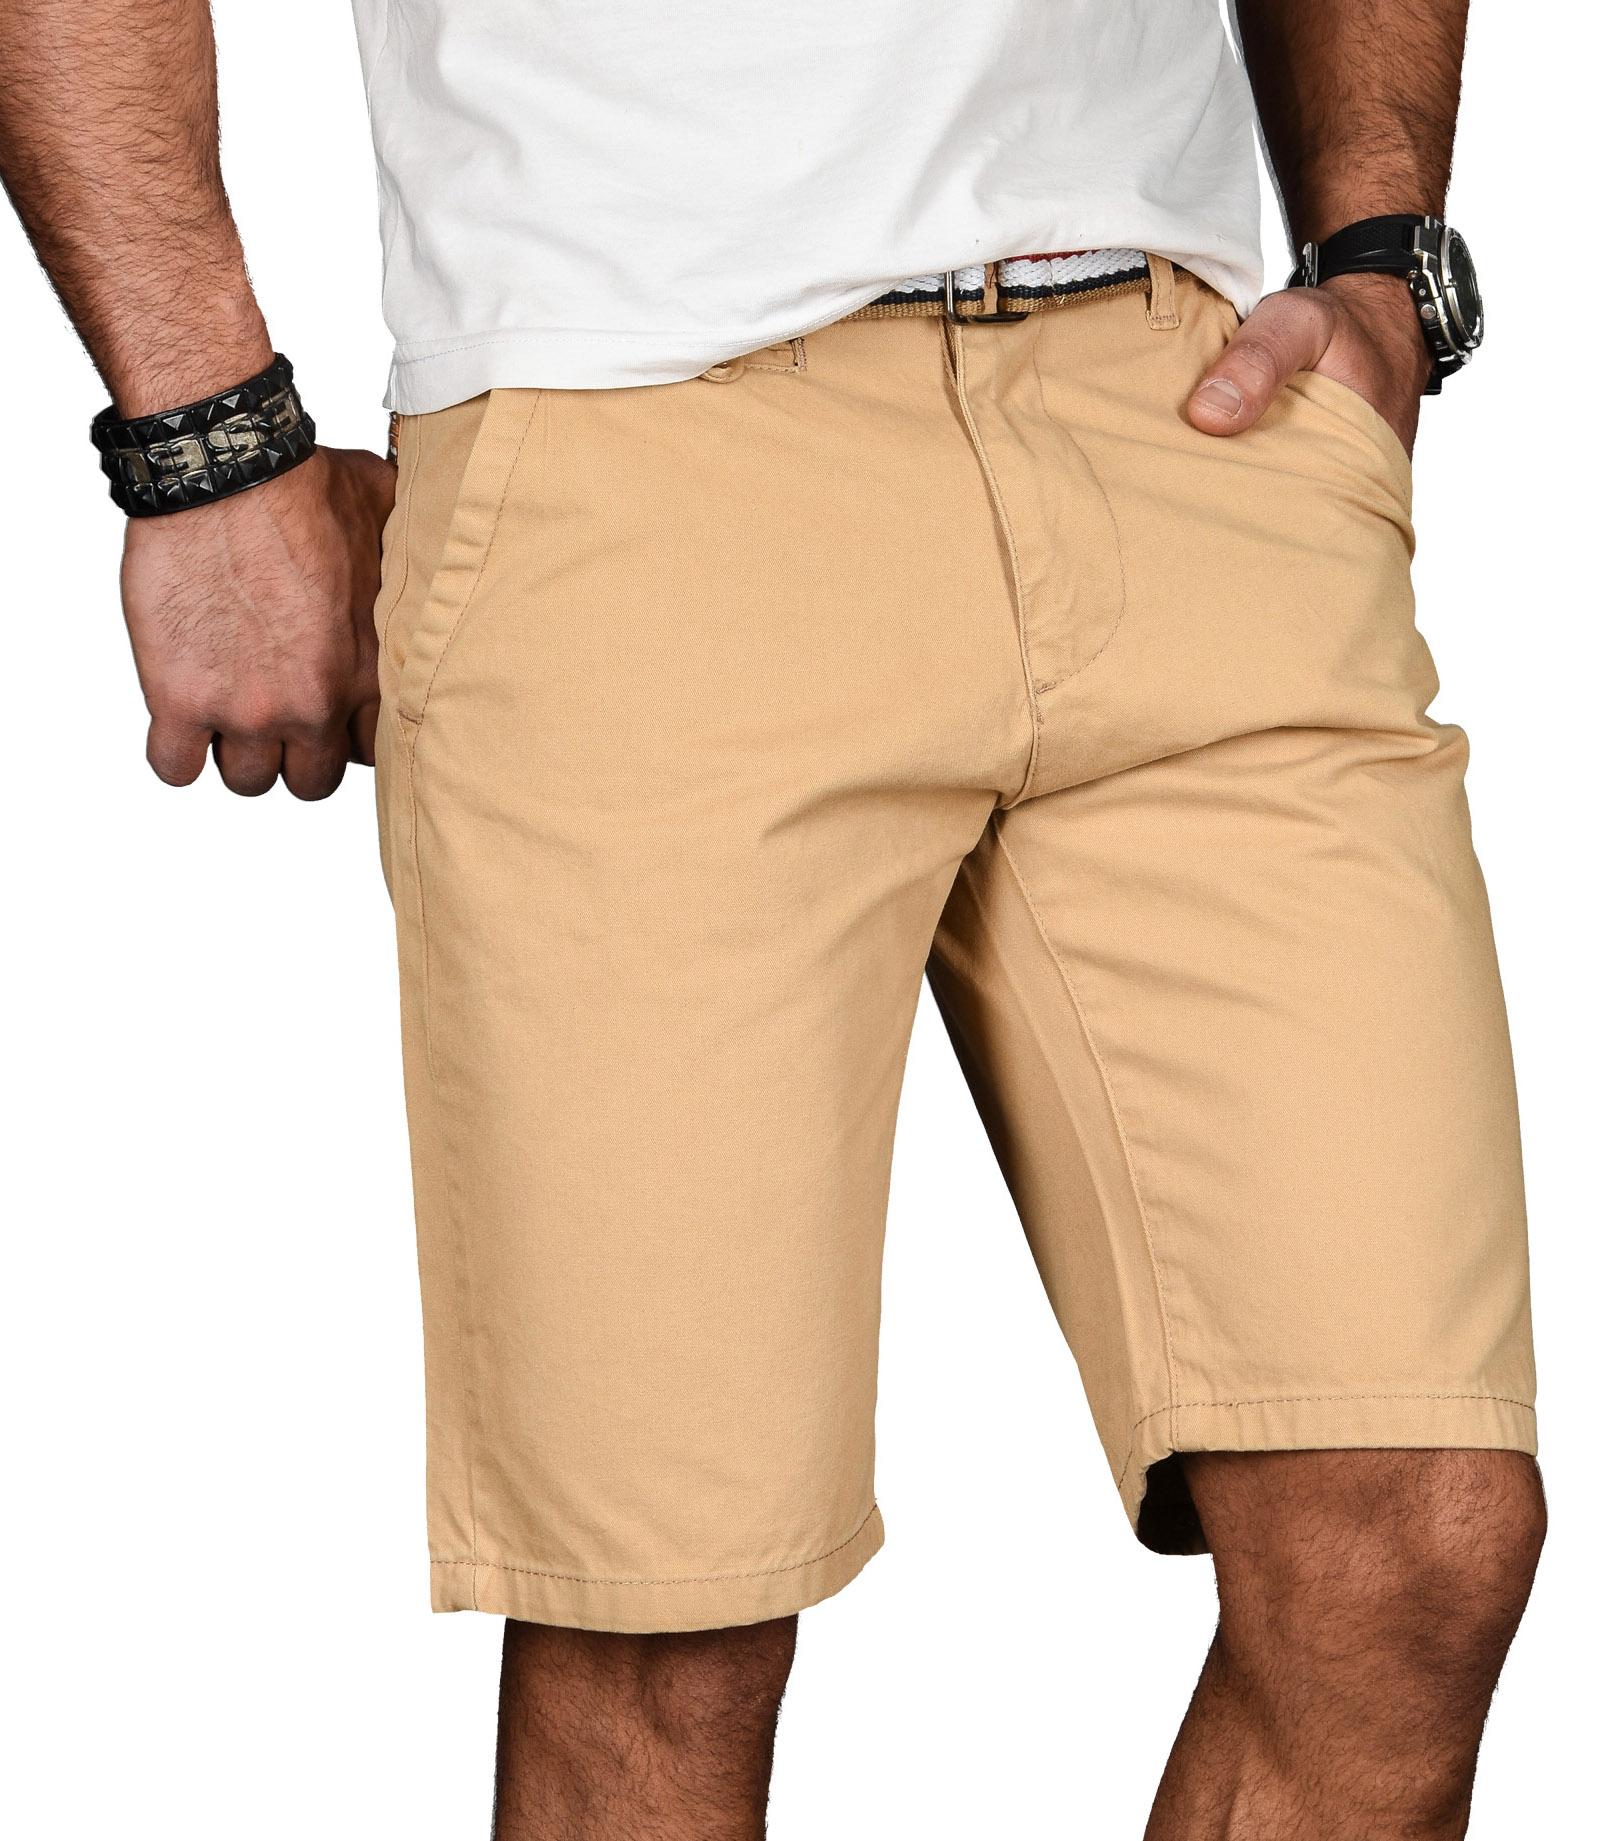 A-Salvarini-Herren-Shorts-kurze-Sommer-Hose-mit-Guertel-Short-Bermuda-NEU-AS096 Indexbild 26